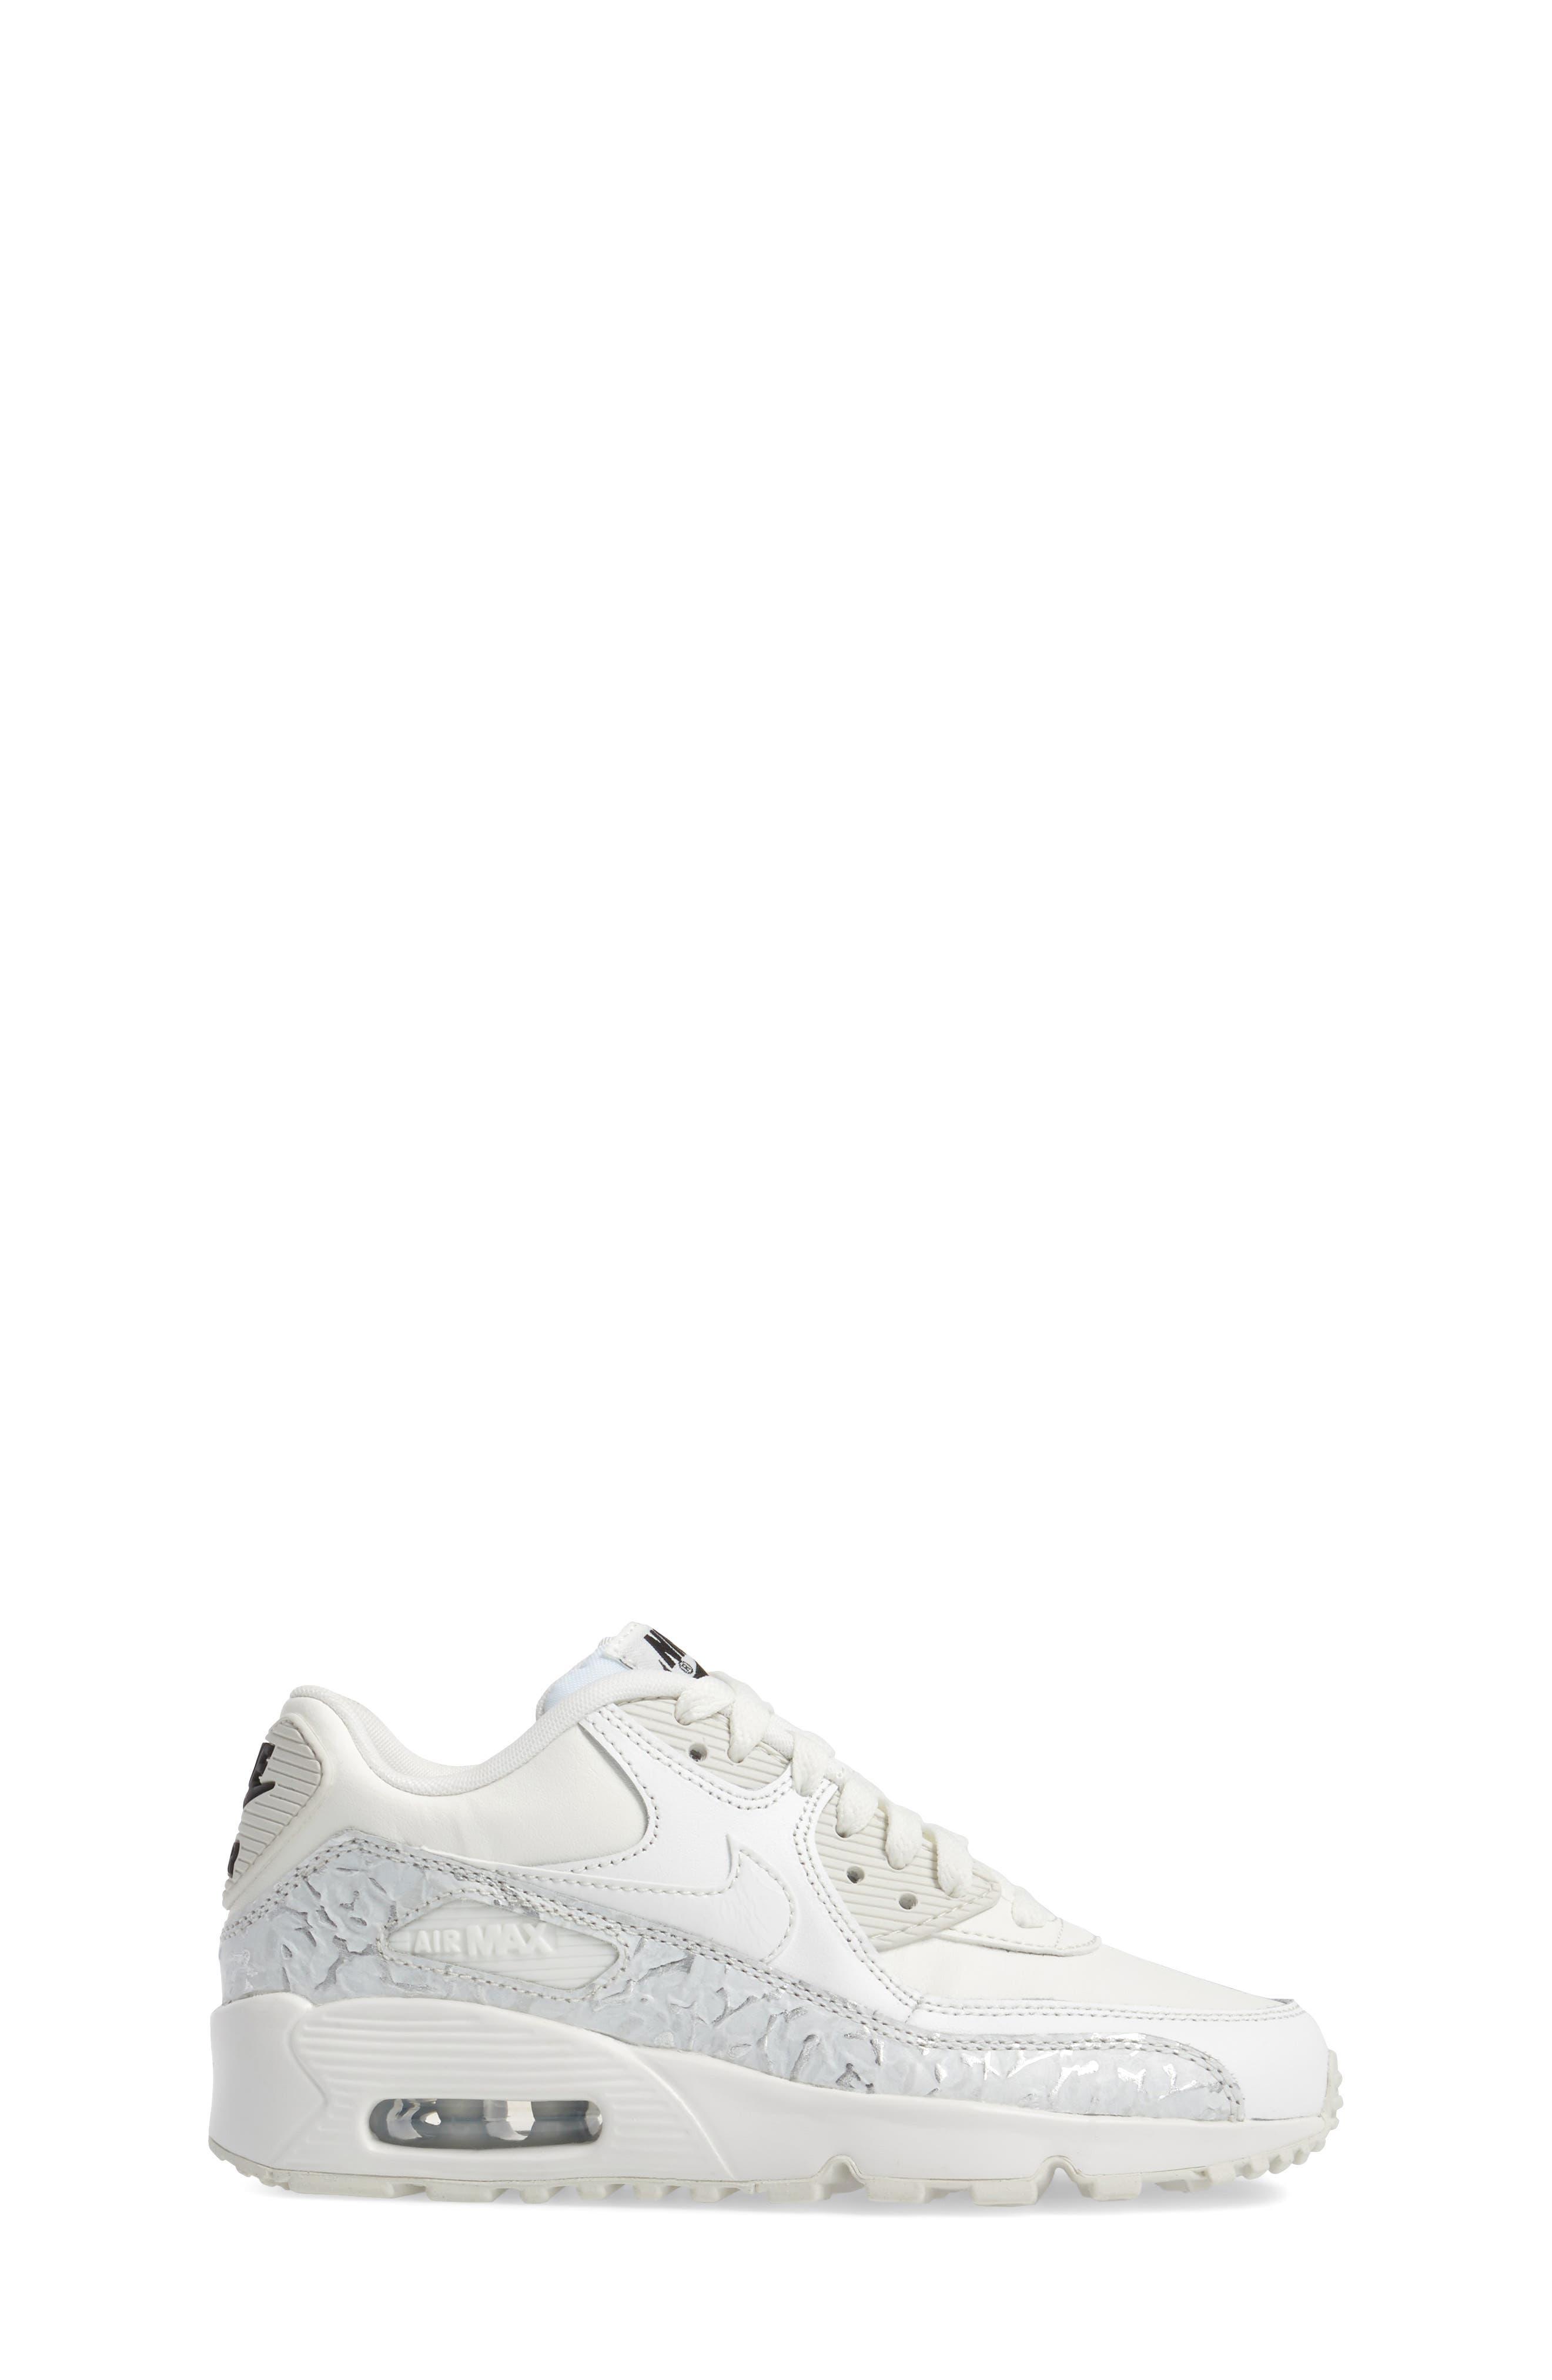 Alternate Image 3  - Nike Air Max 90 Leather Sneaker (Big Kid)